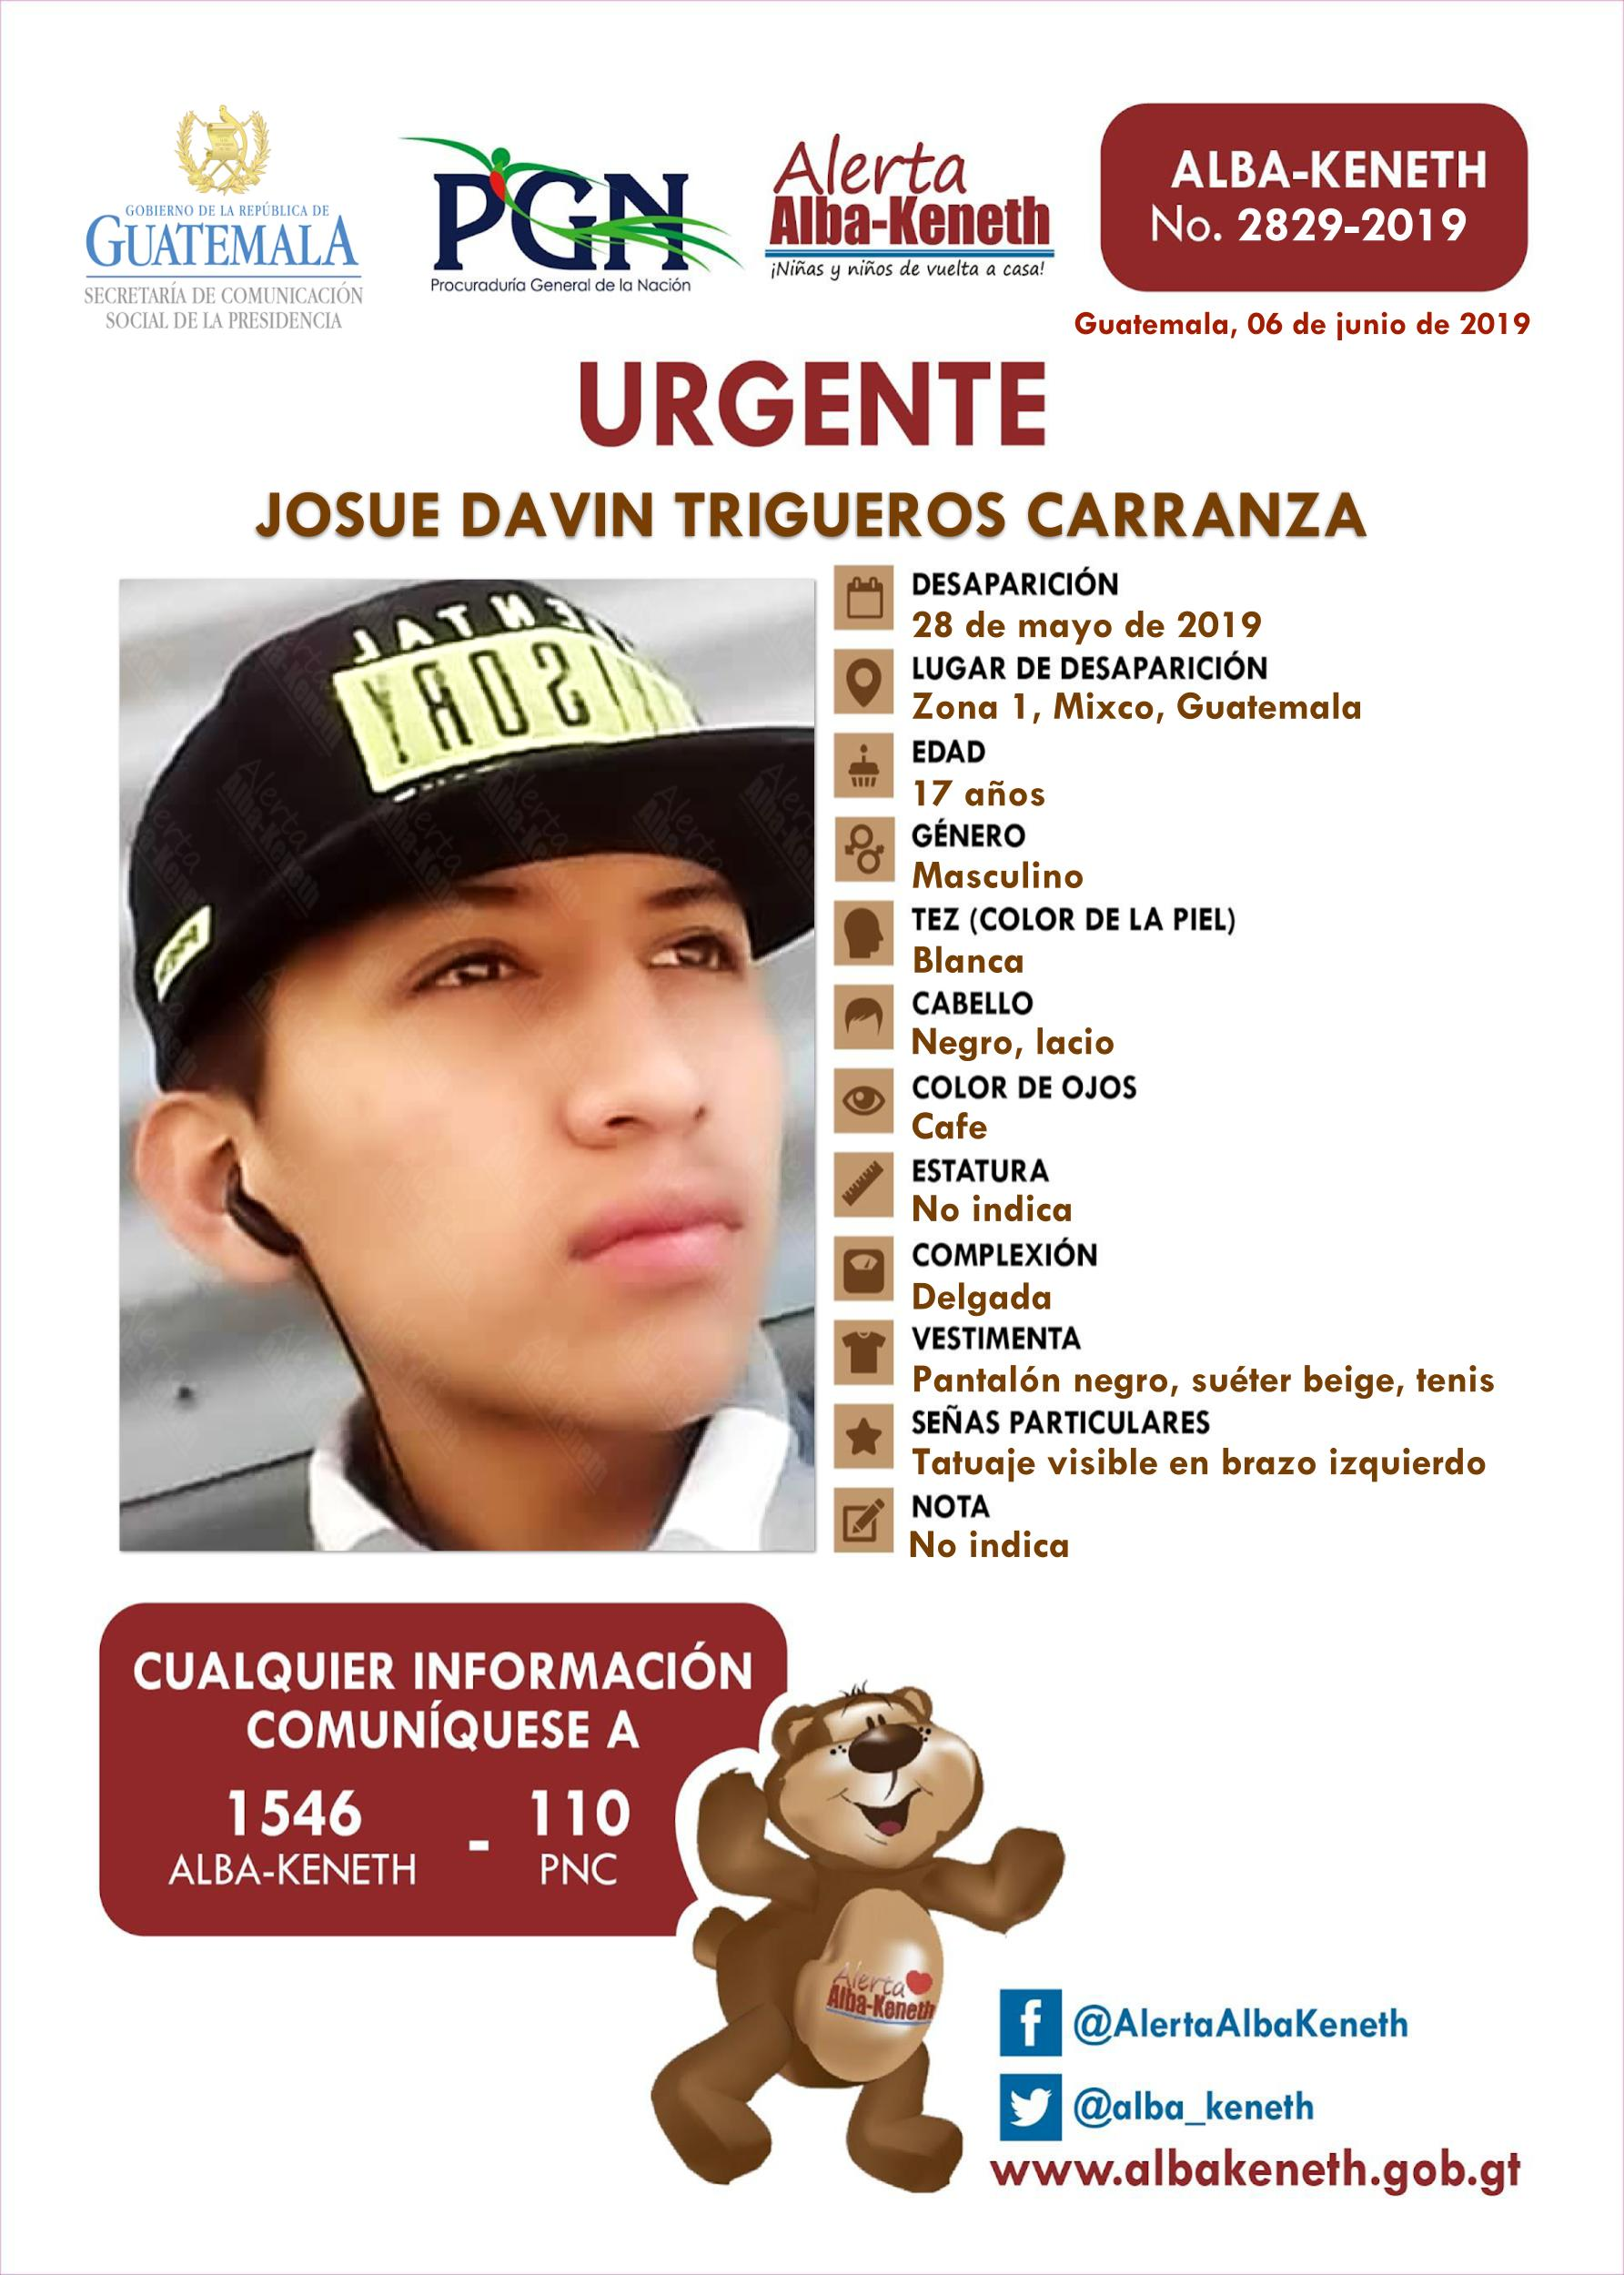 Josue Davin Trigueros Carranza